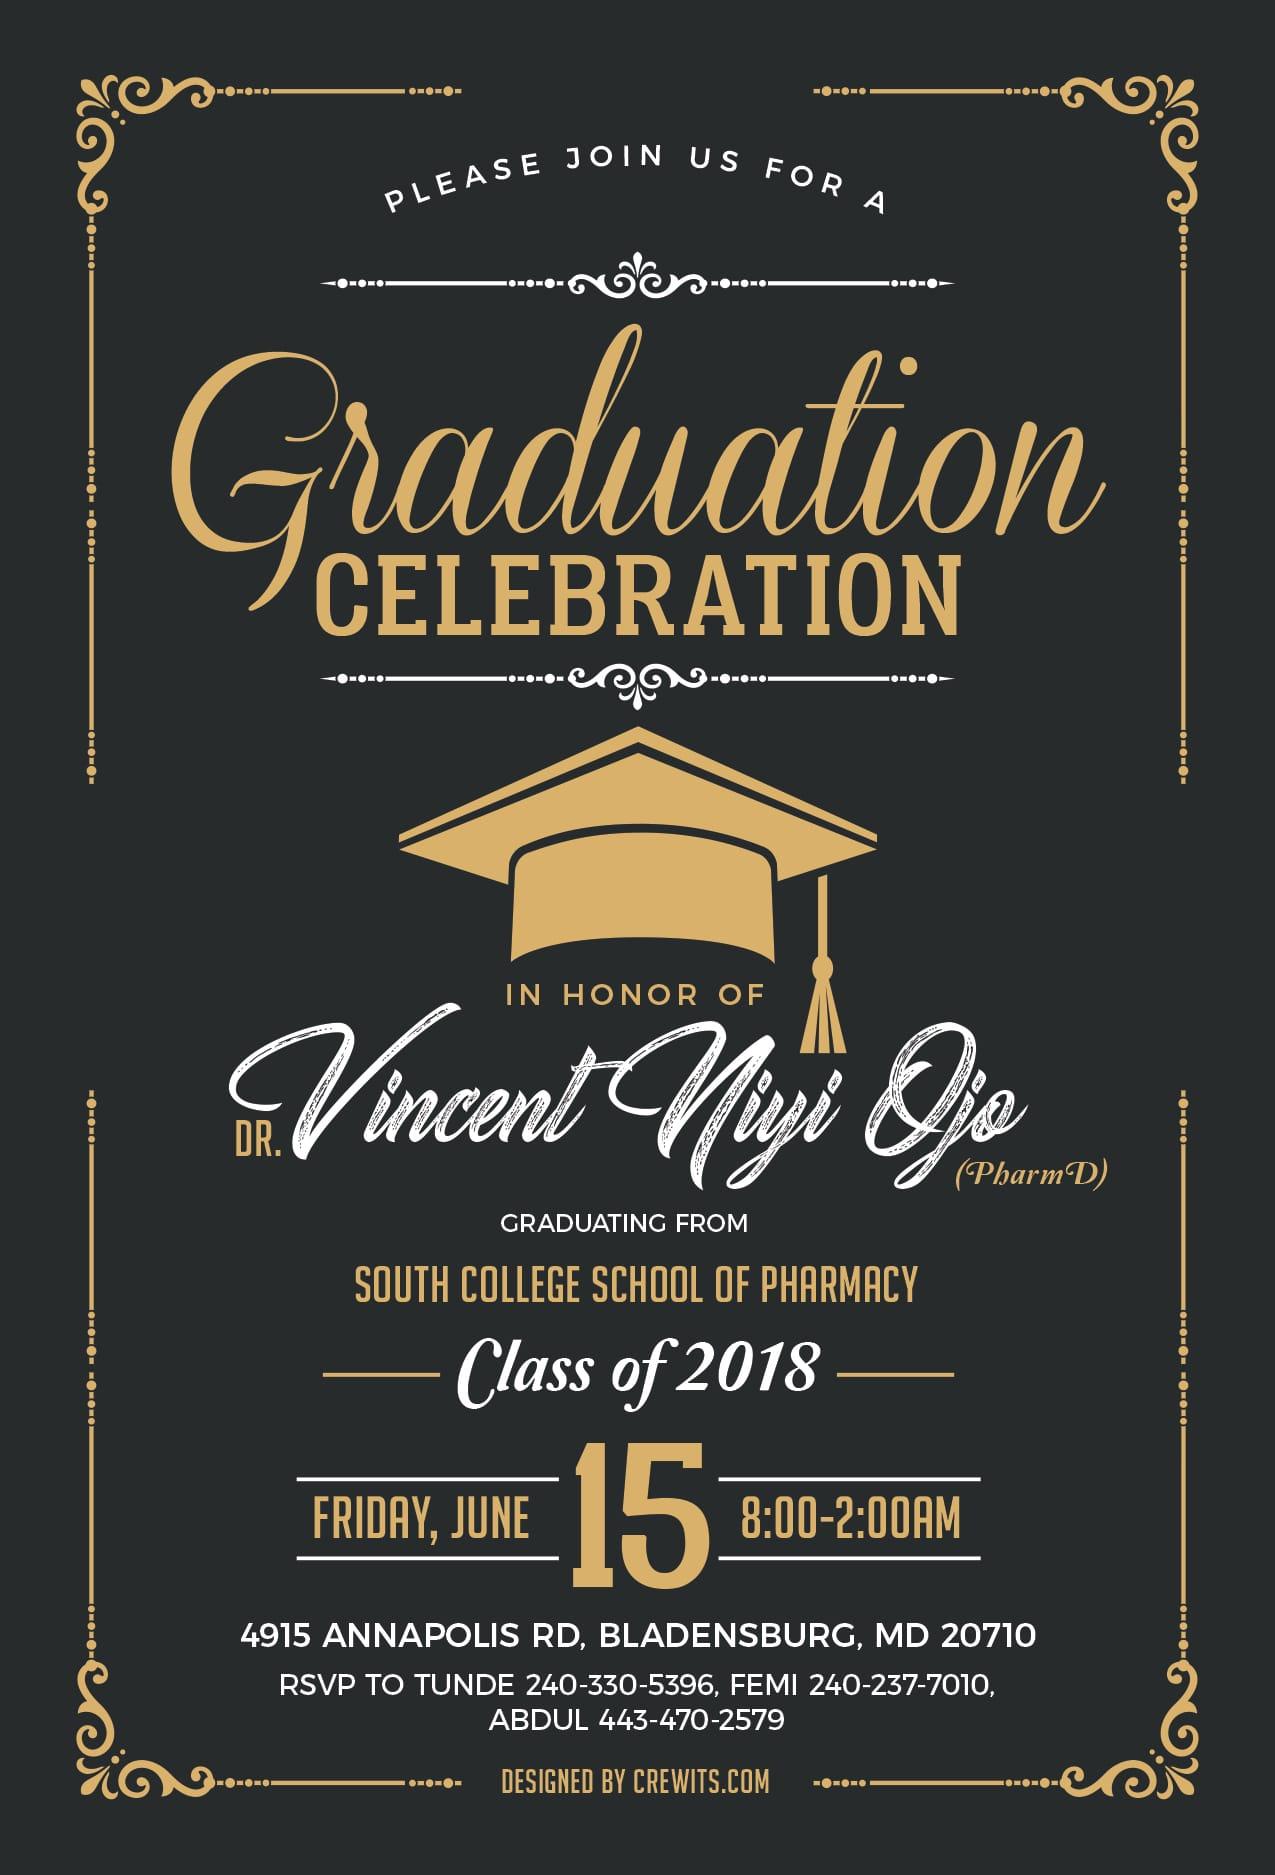 Graduation Party Copy